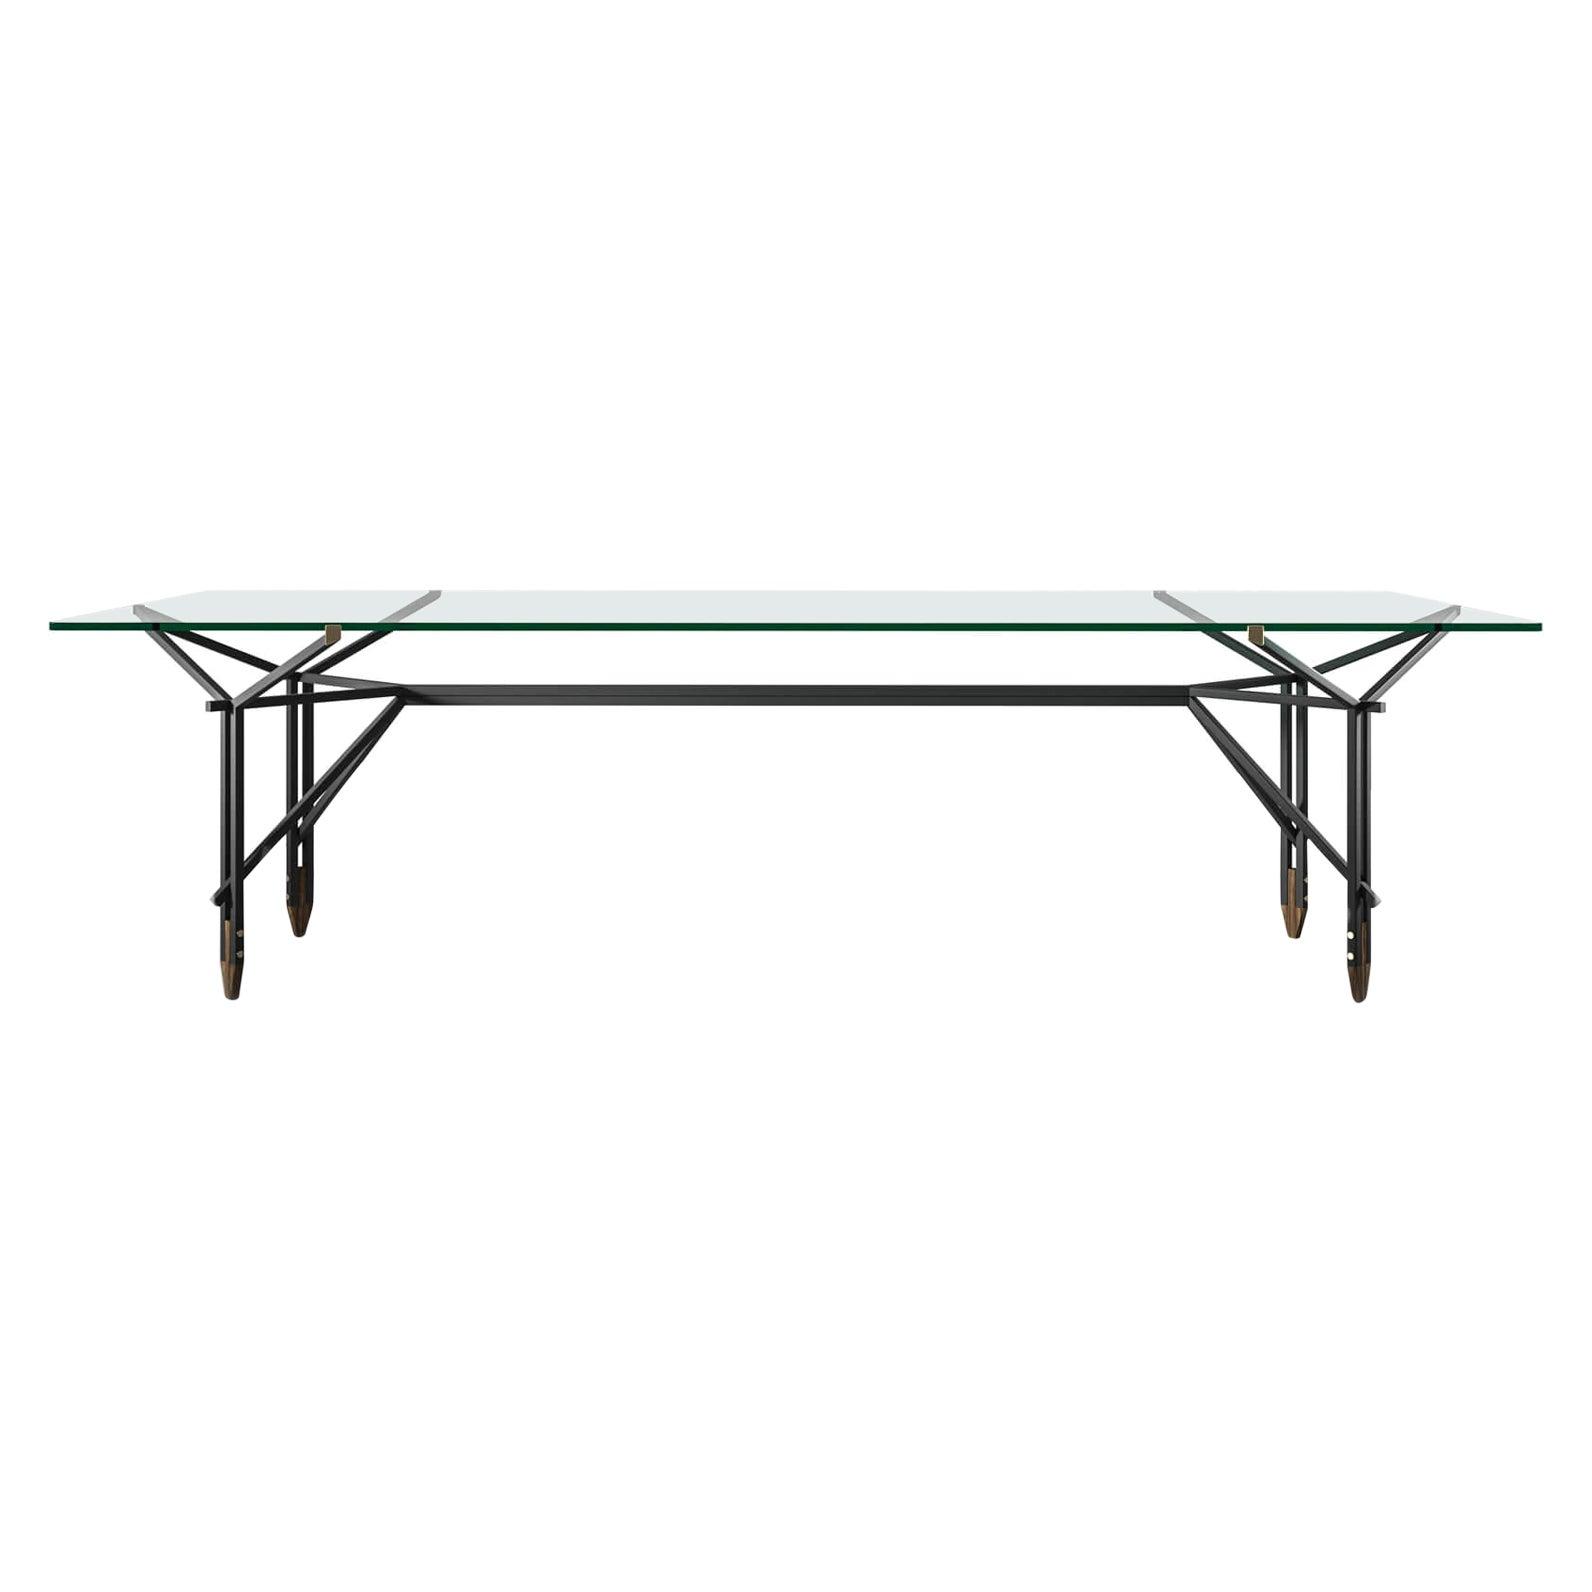 Ico Parisi Olimpino Table by Cassina